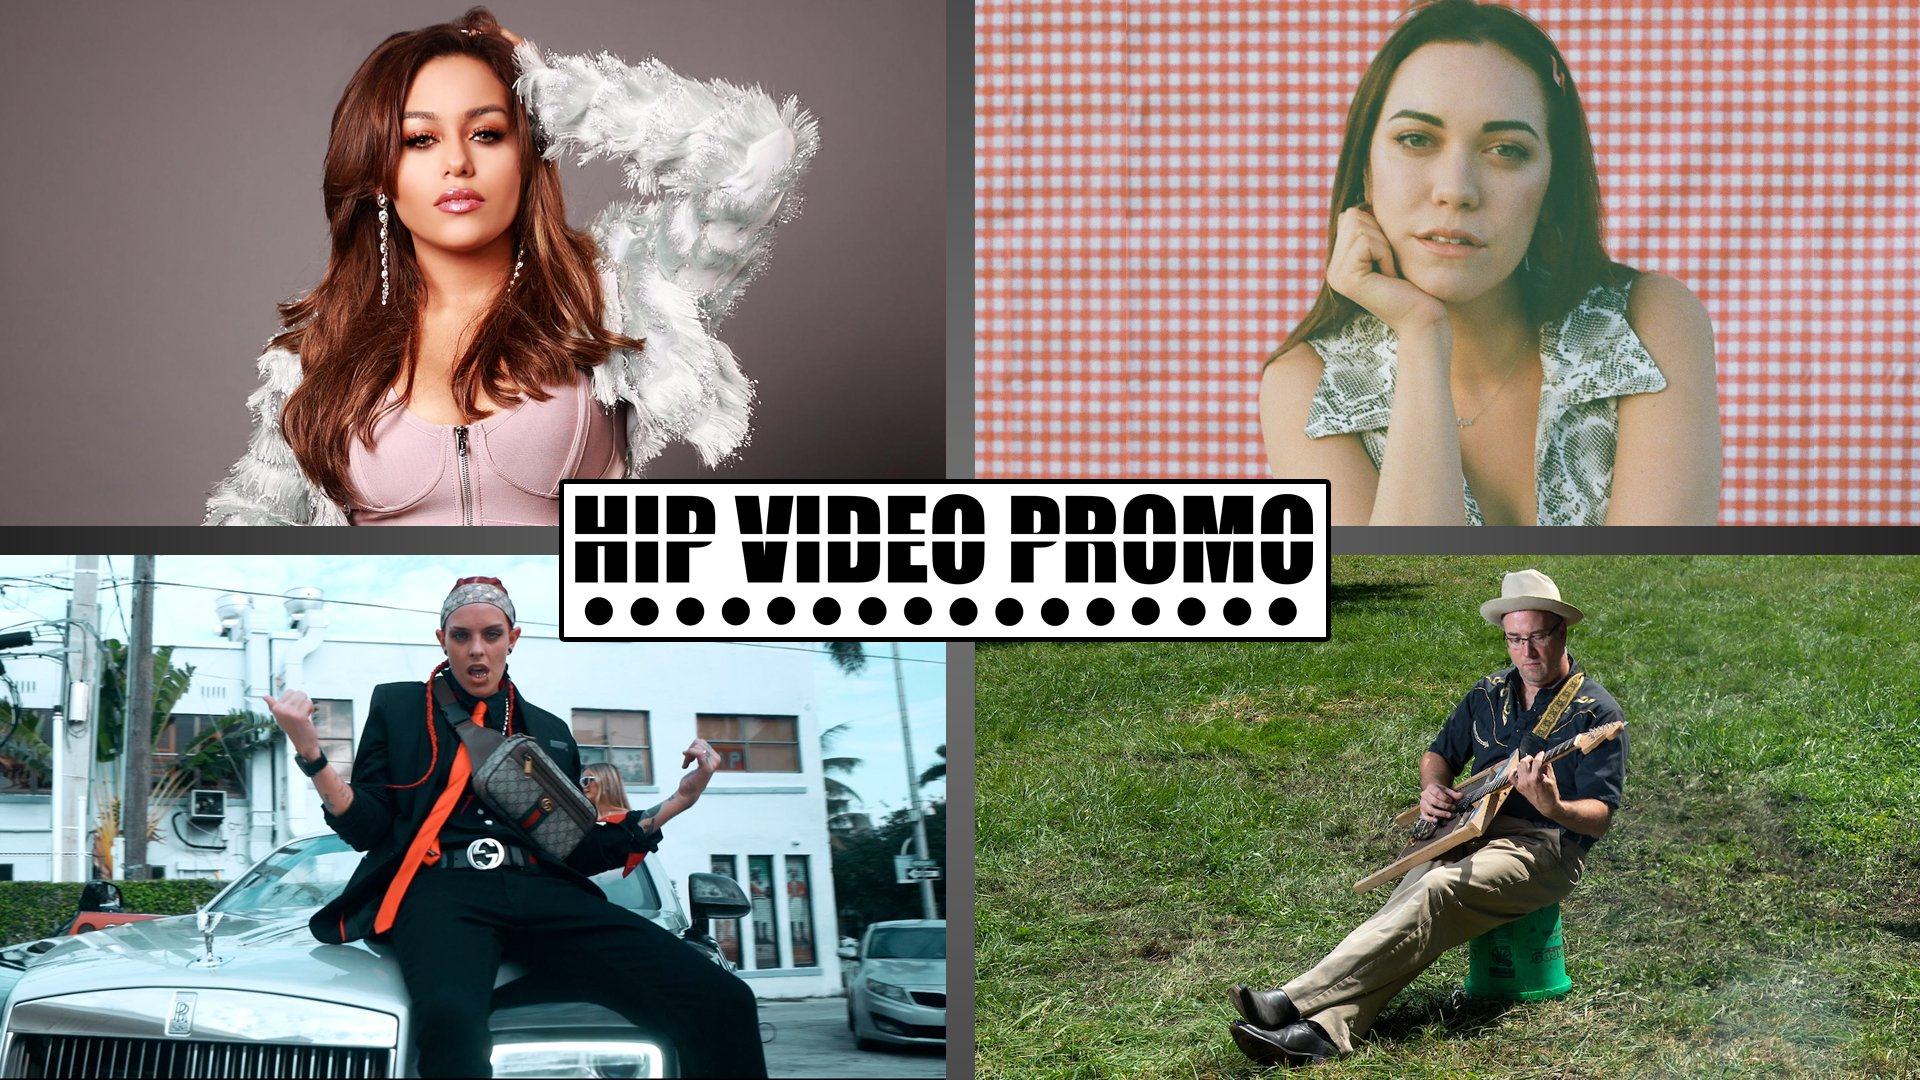 HIP Video Promo - weekly recap 2/5/2020